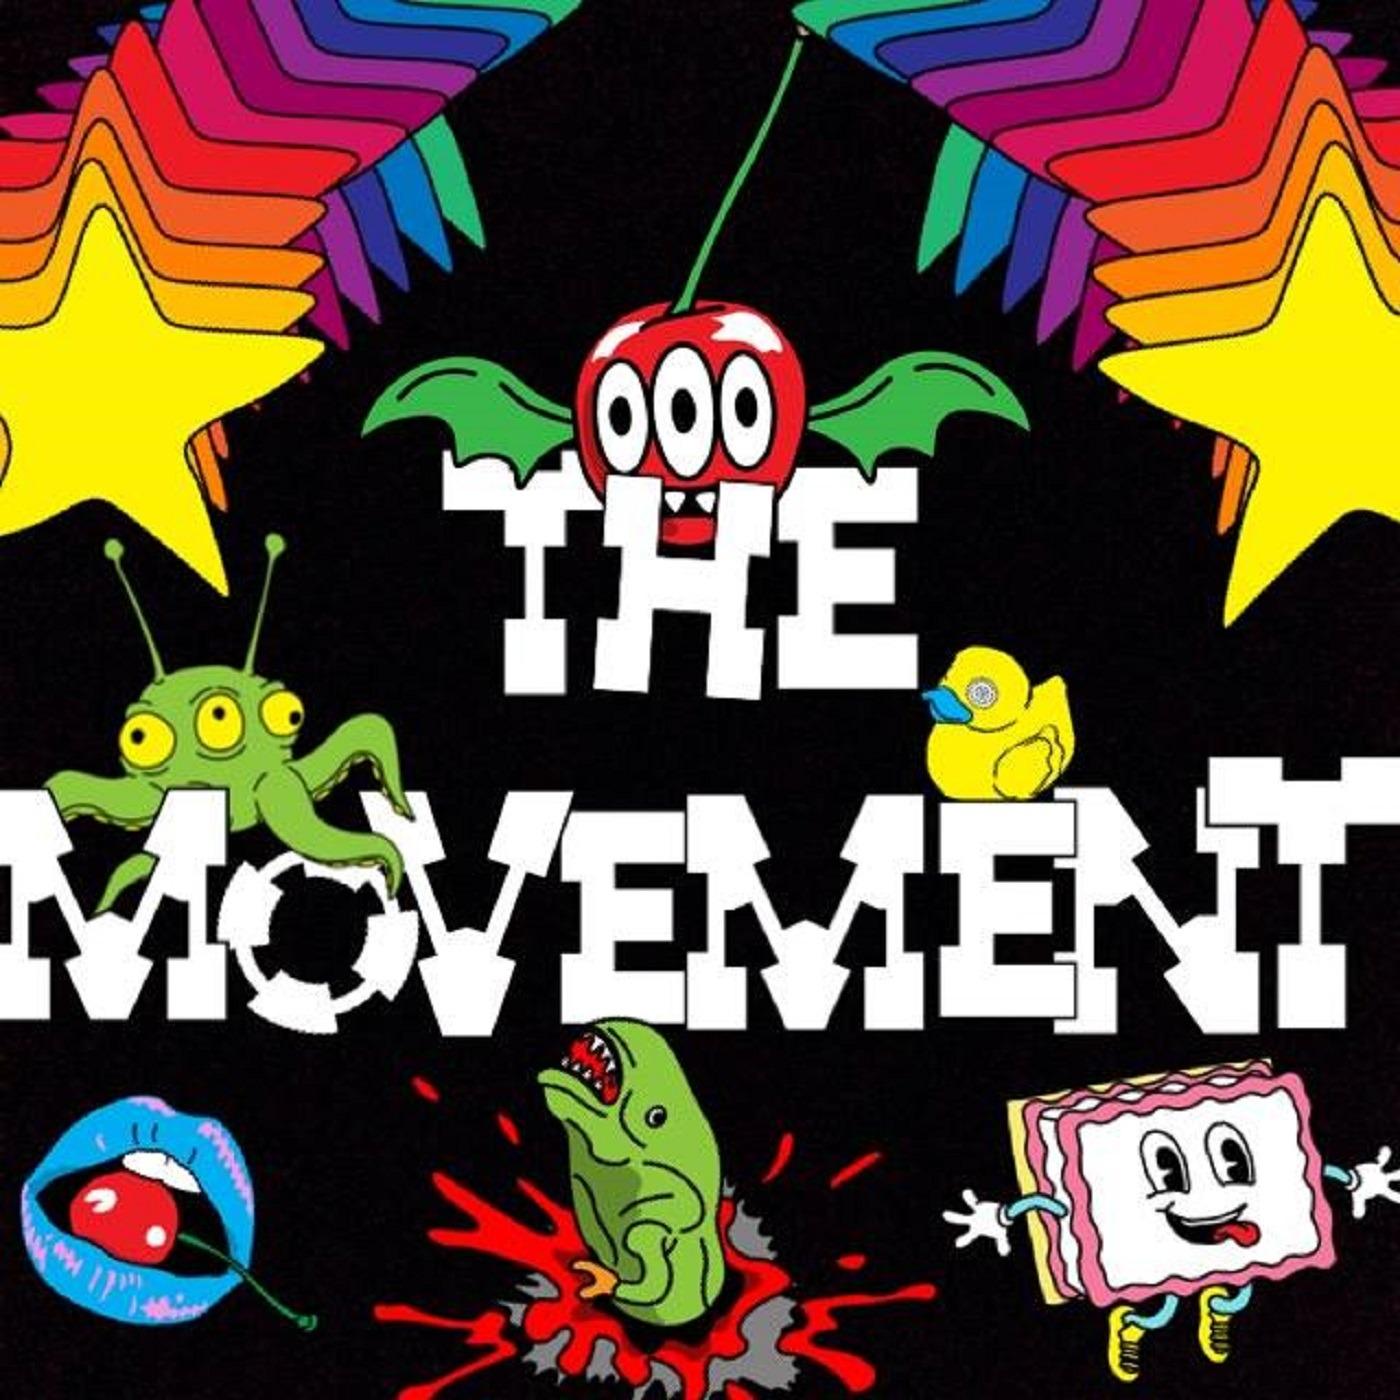 DjankyJackson presents: The Movement